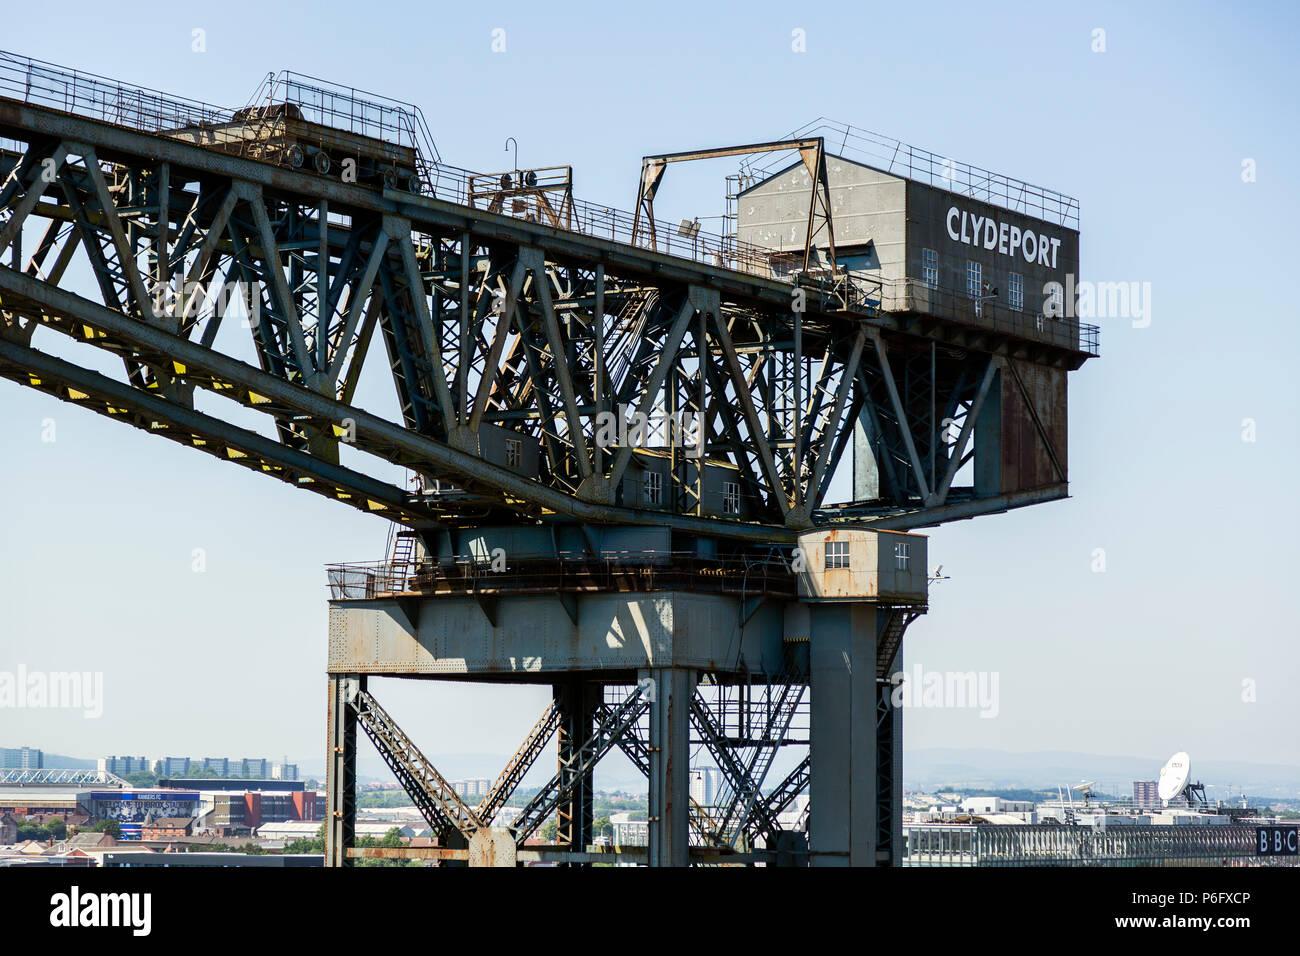 Finnieston crane, Anderston, Glasgow, Scotland - Stock Image